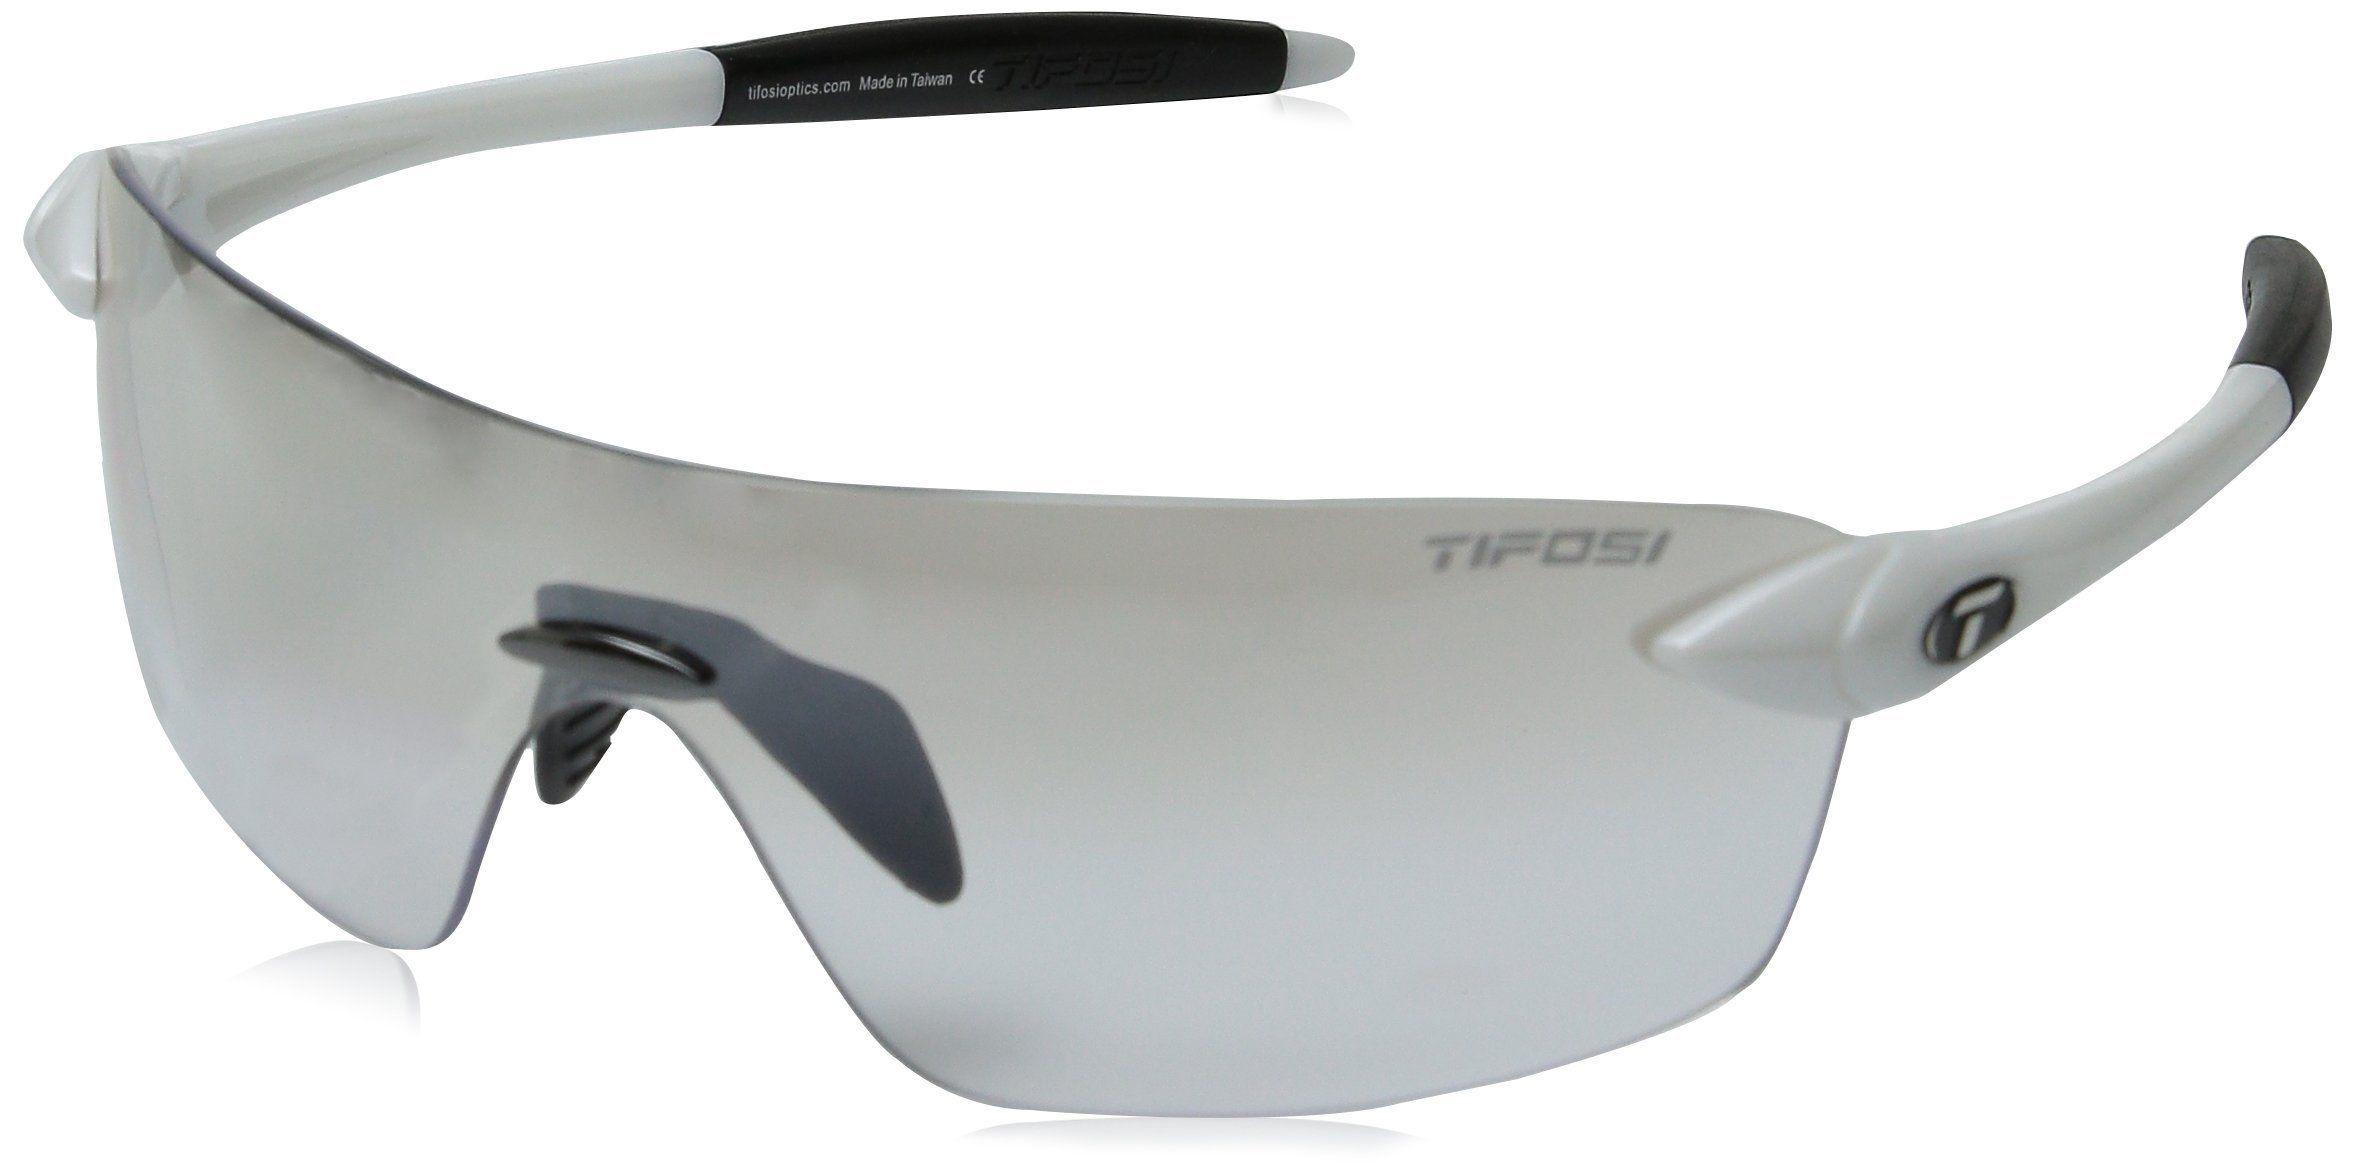 84775c8bf3 Tifosi 2016 Vogel 2.0 Sunglasses Pearl White Smoke Gradient NEW. Frame  type  frameless.